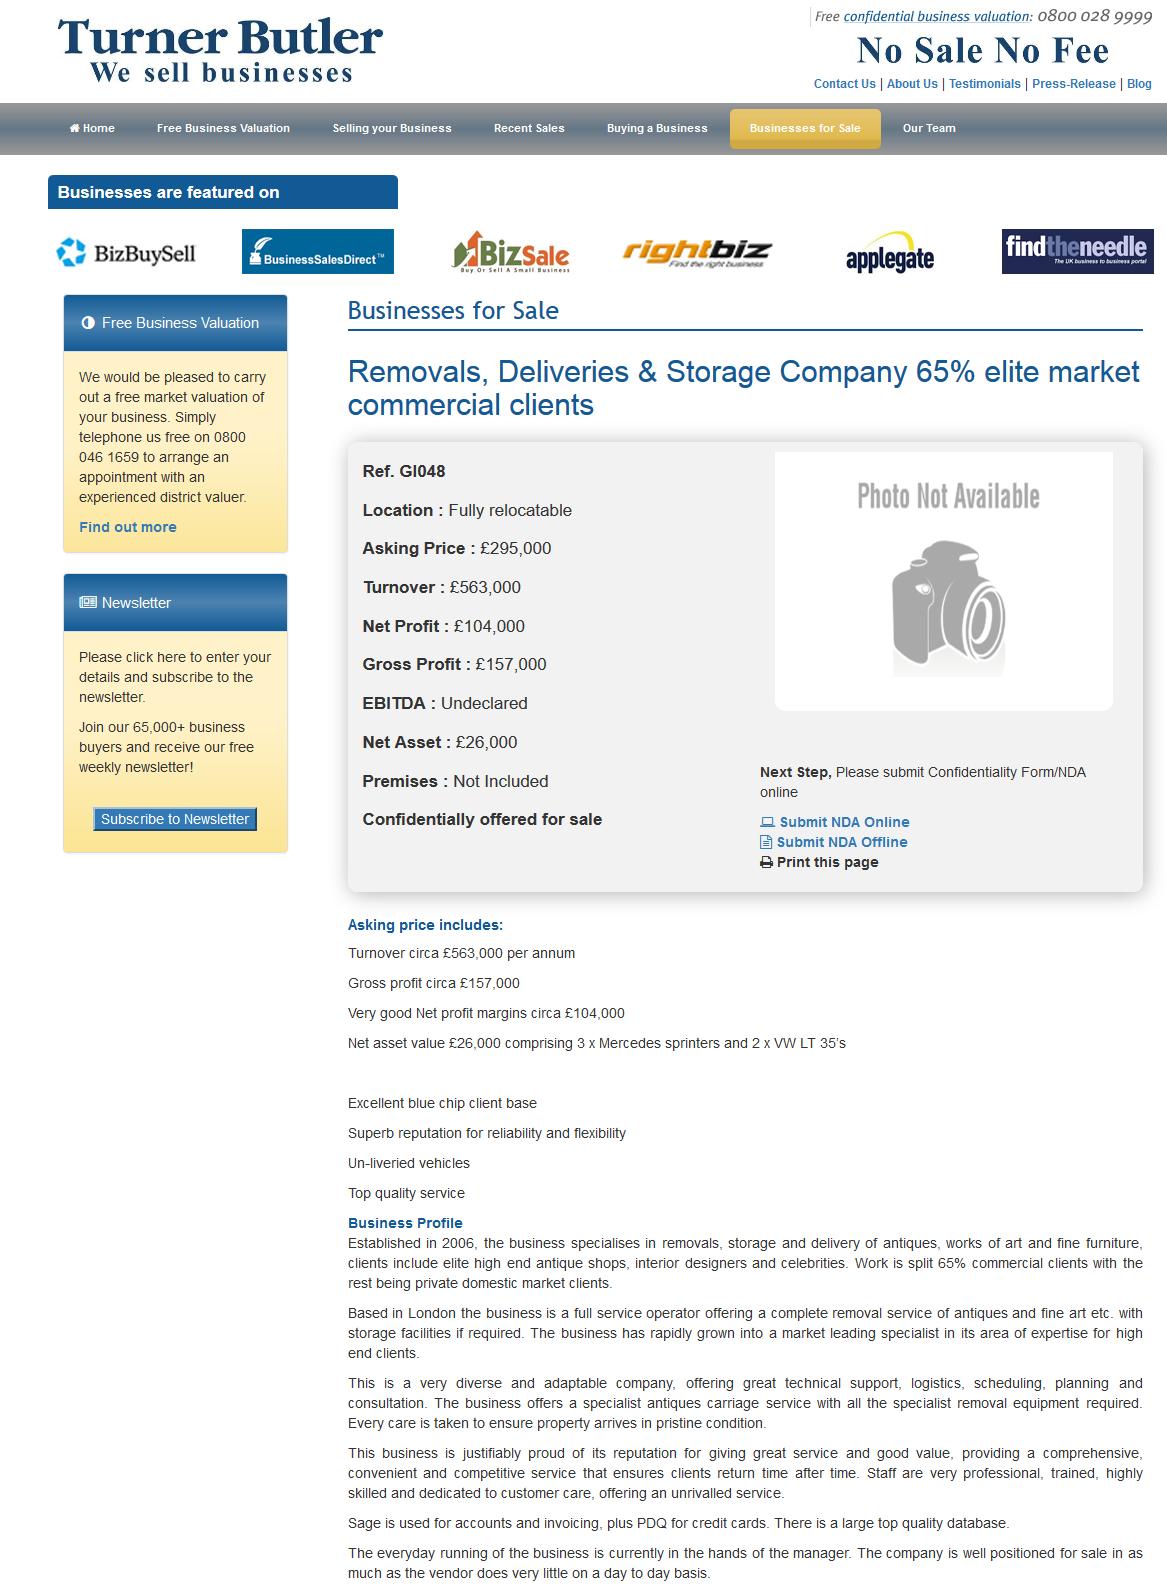 Businesses For Sale Removals Deliveries Storage Company 65 Elite Market Commercial Clients Ref